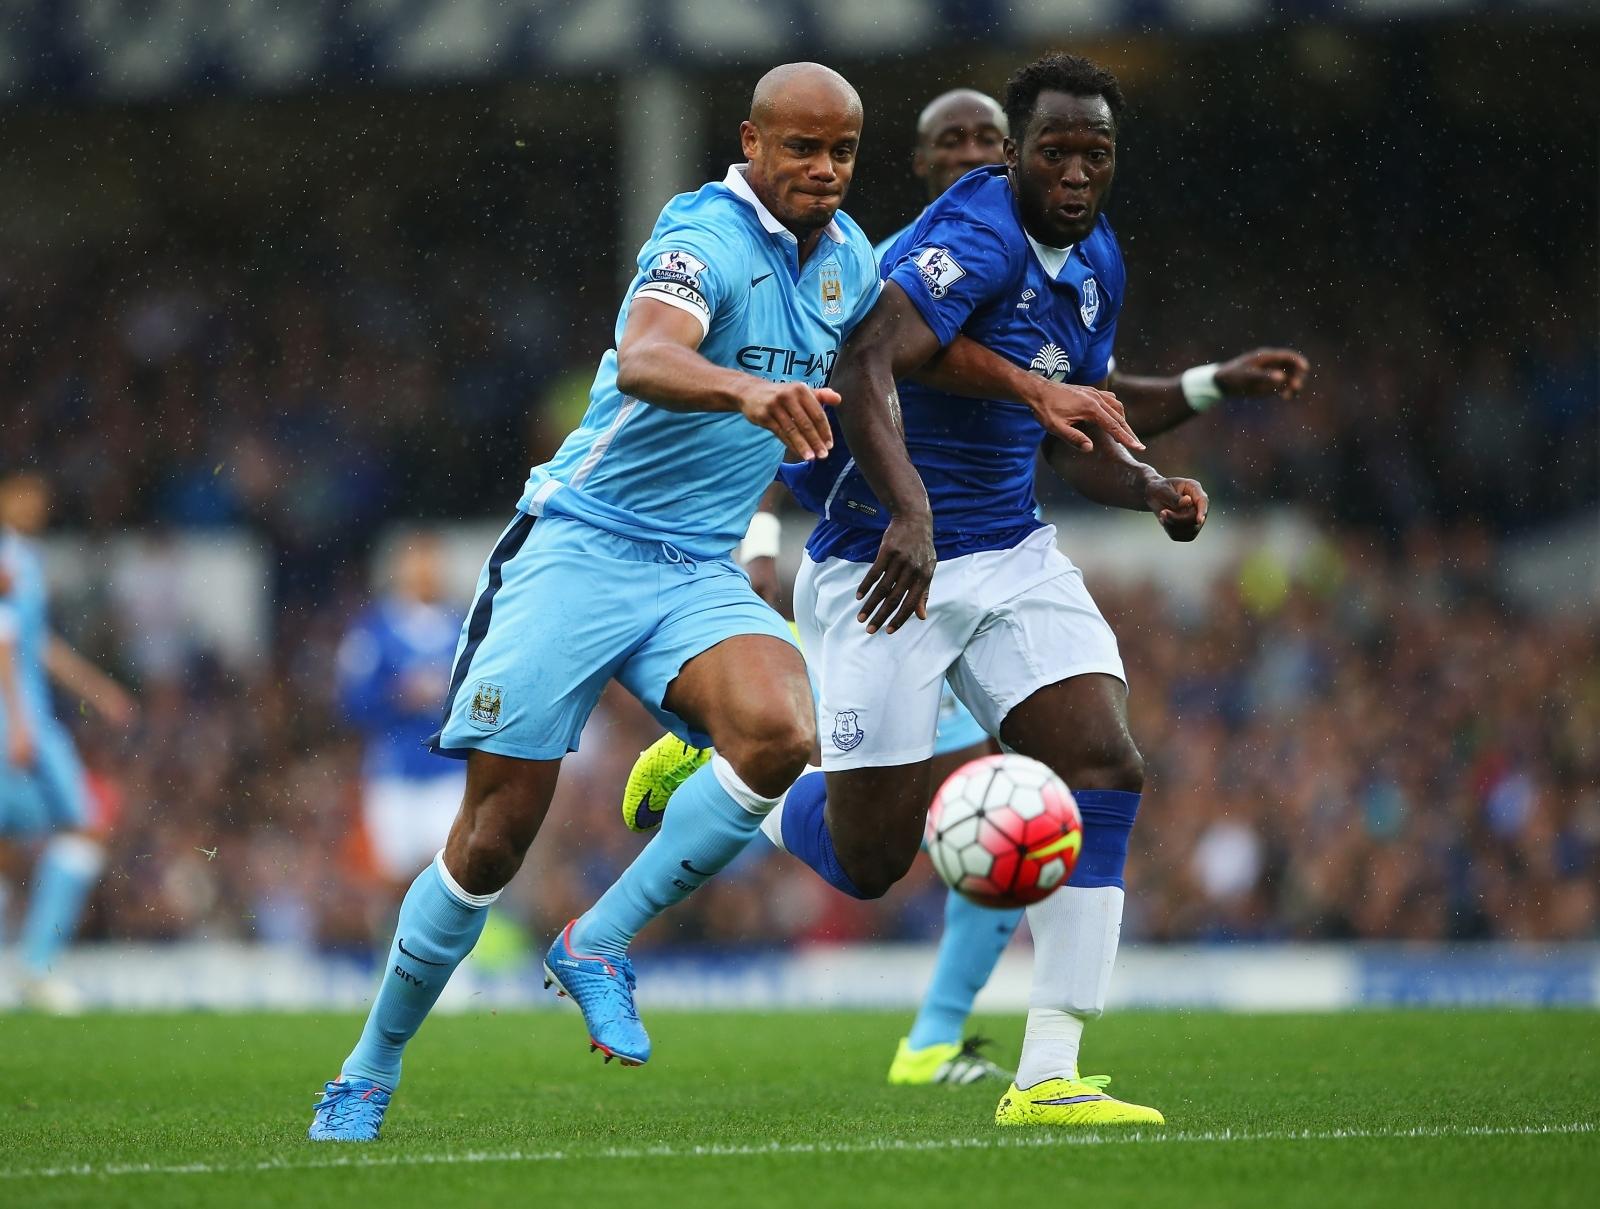 Vincent Kompany praises Manchester United new boy Romelu Lukaku